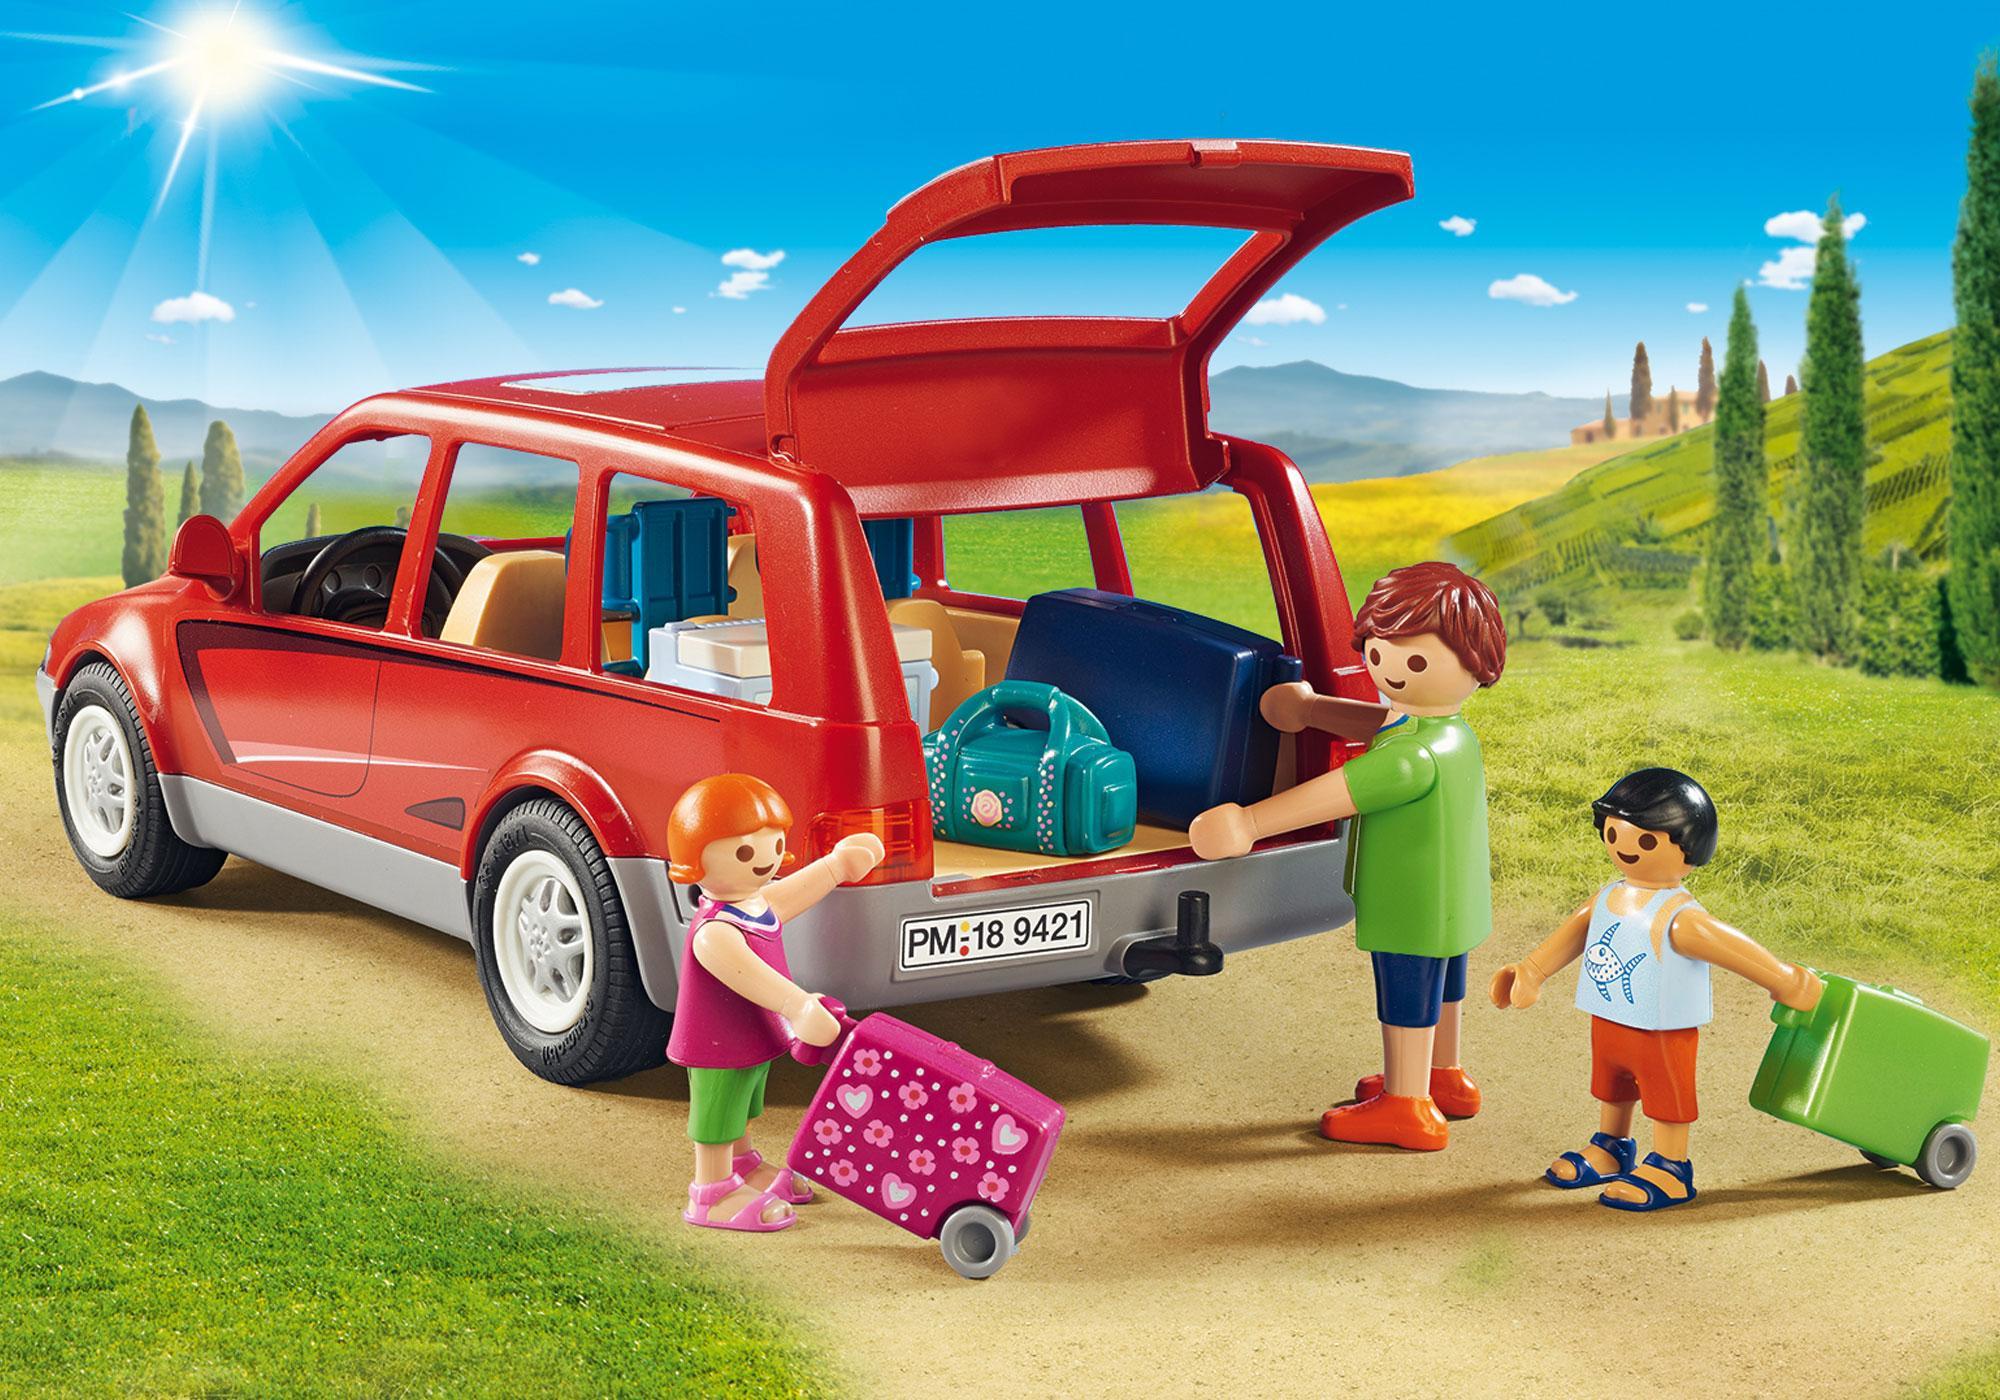 http://media.playmobil.com/i/playmobil/9421_product_extra1/Family Car